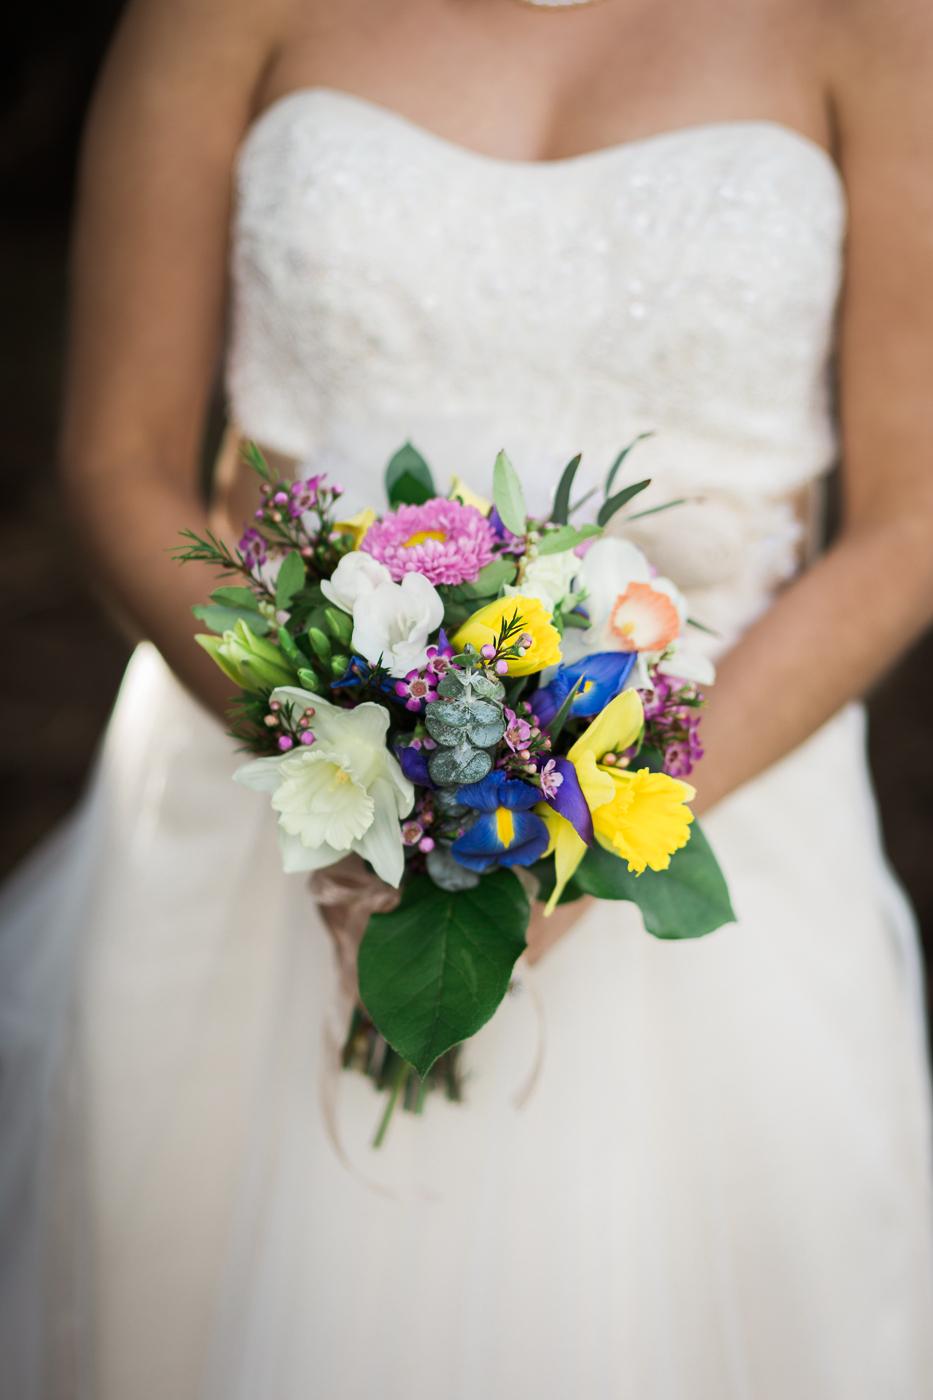 Mendocino-wedding-elopement-stanford-inn-maria-villano-18.jpg